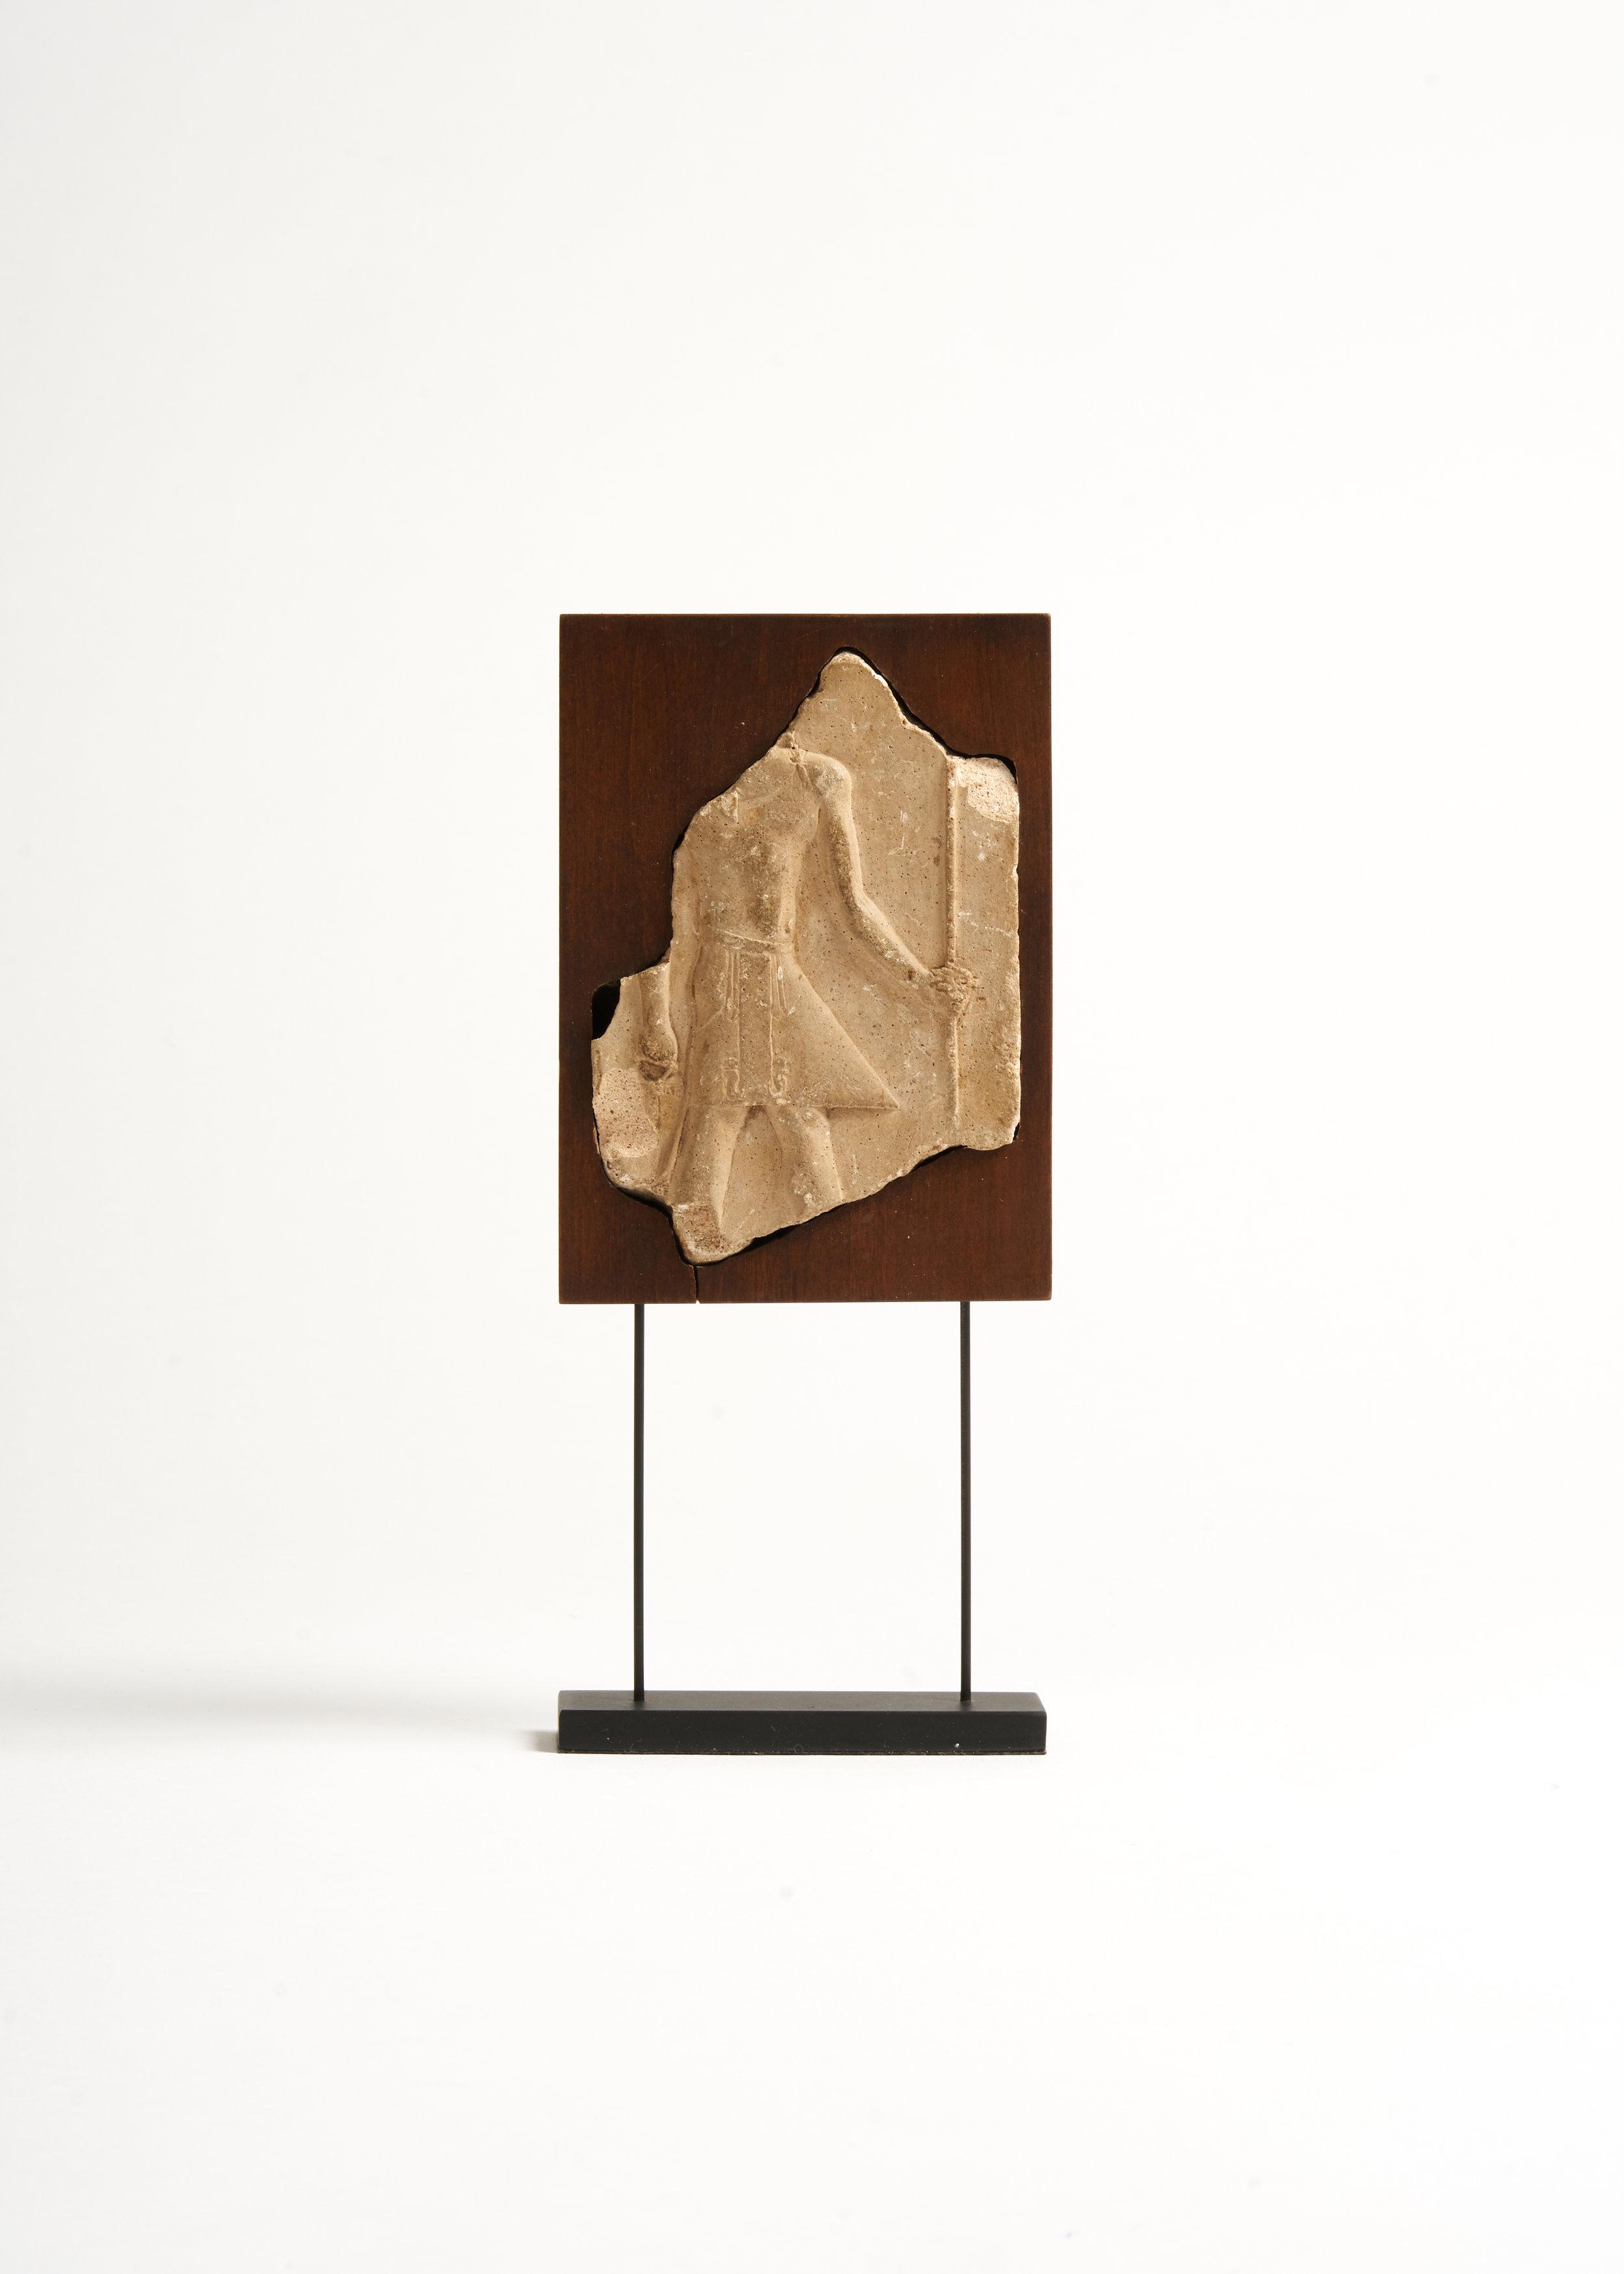 Fragment of a Sculptor's Model